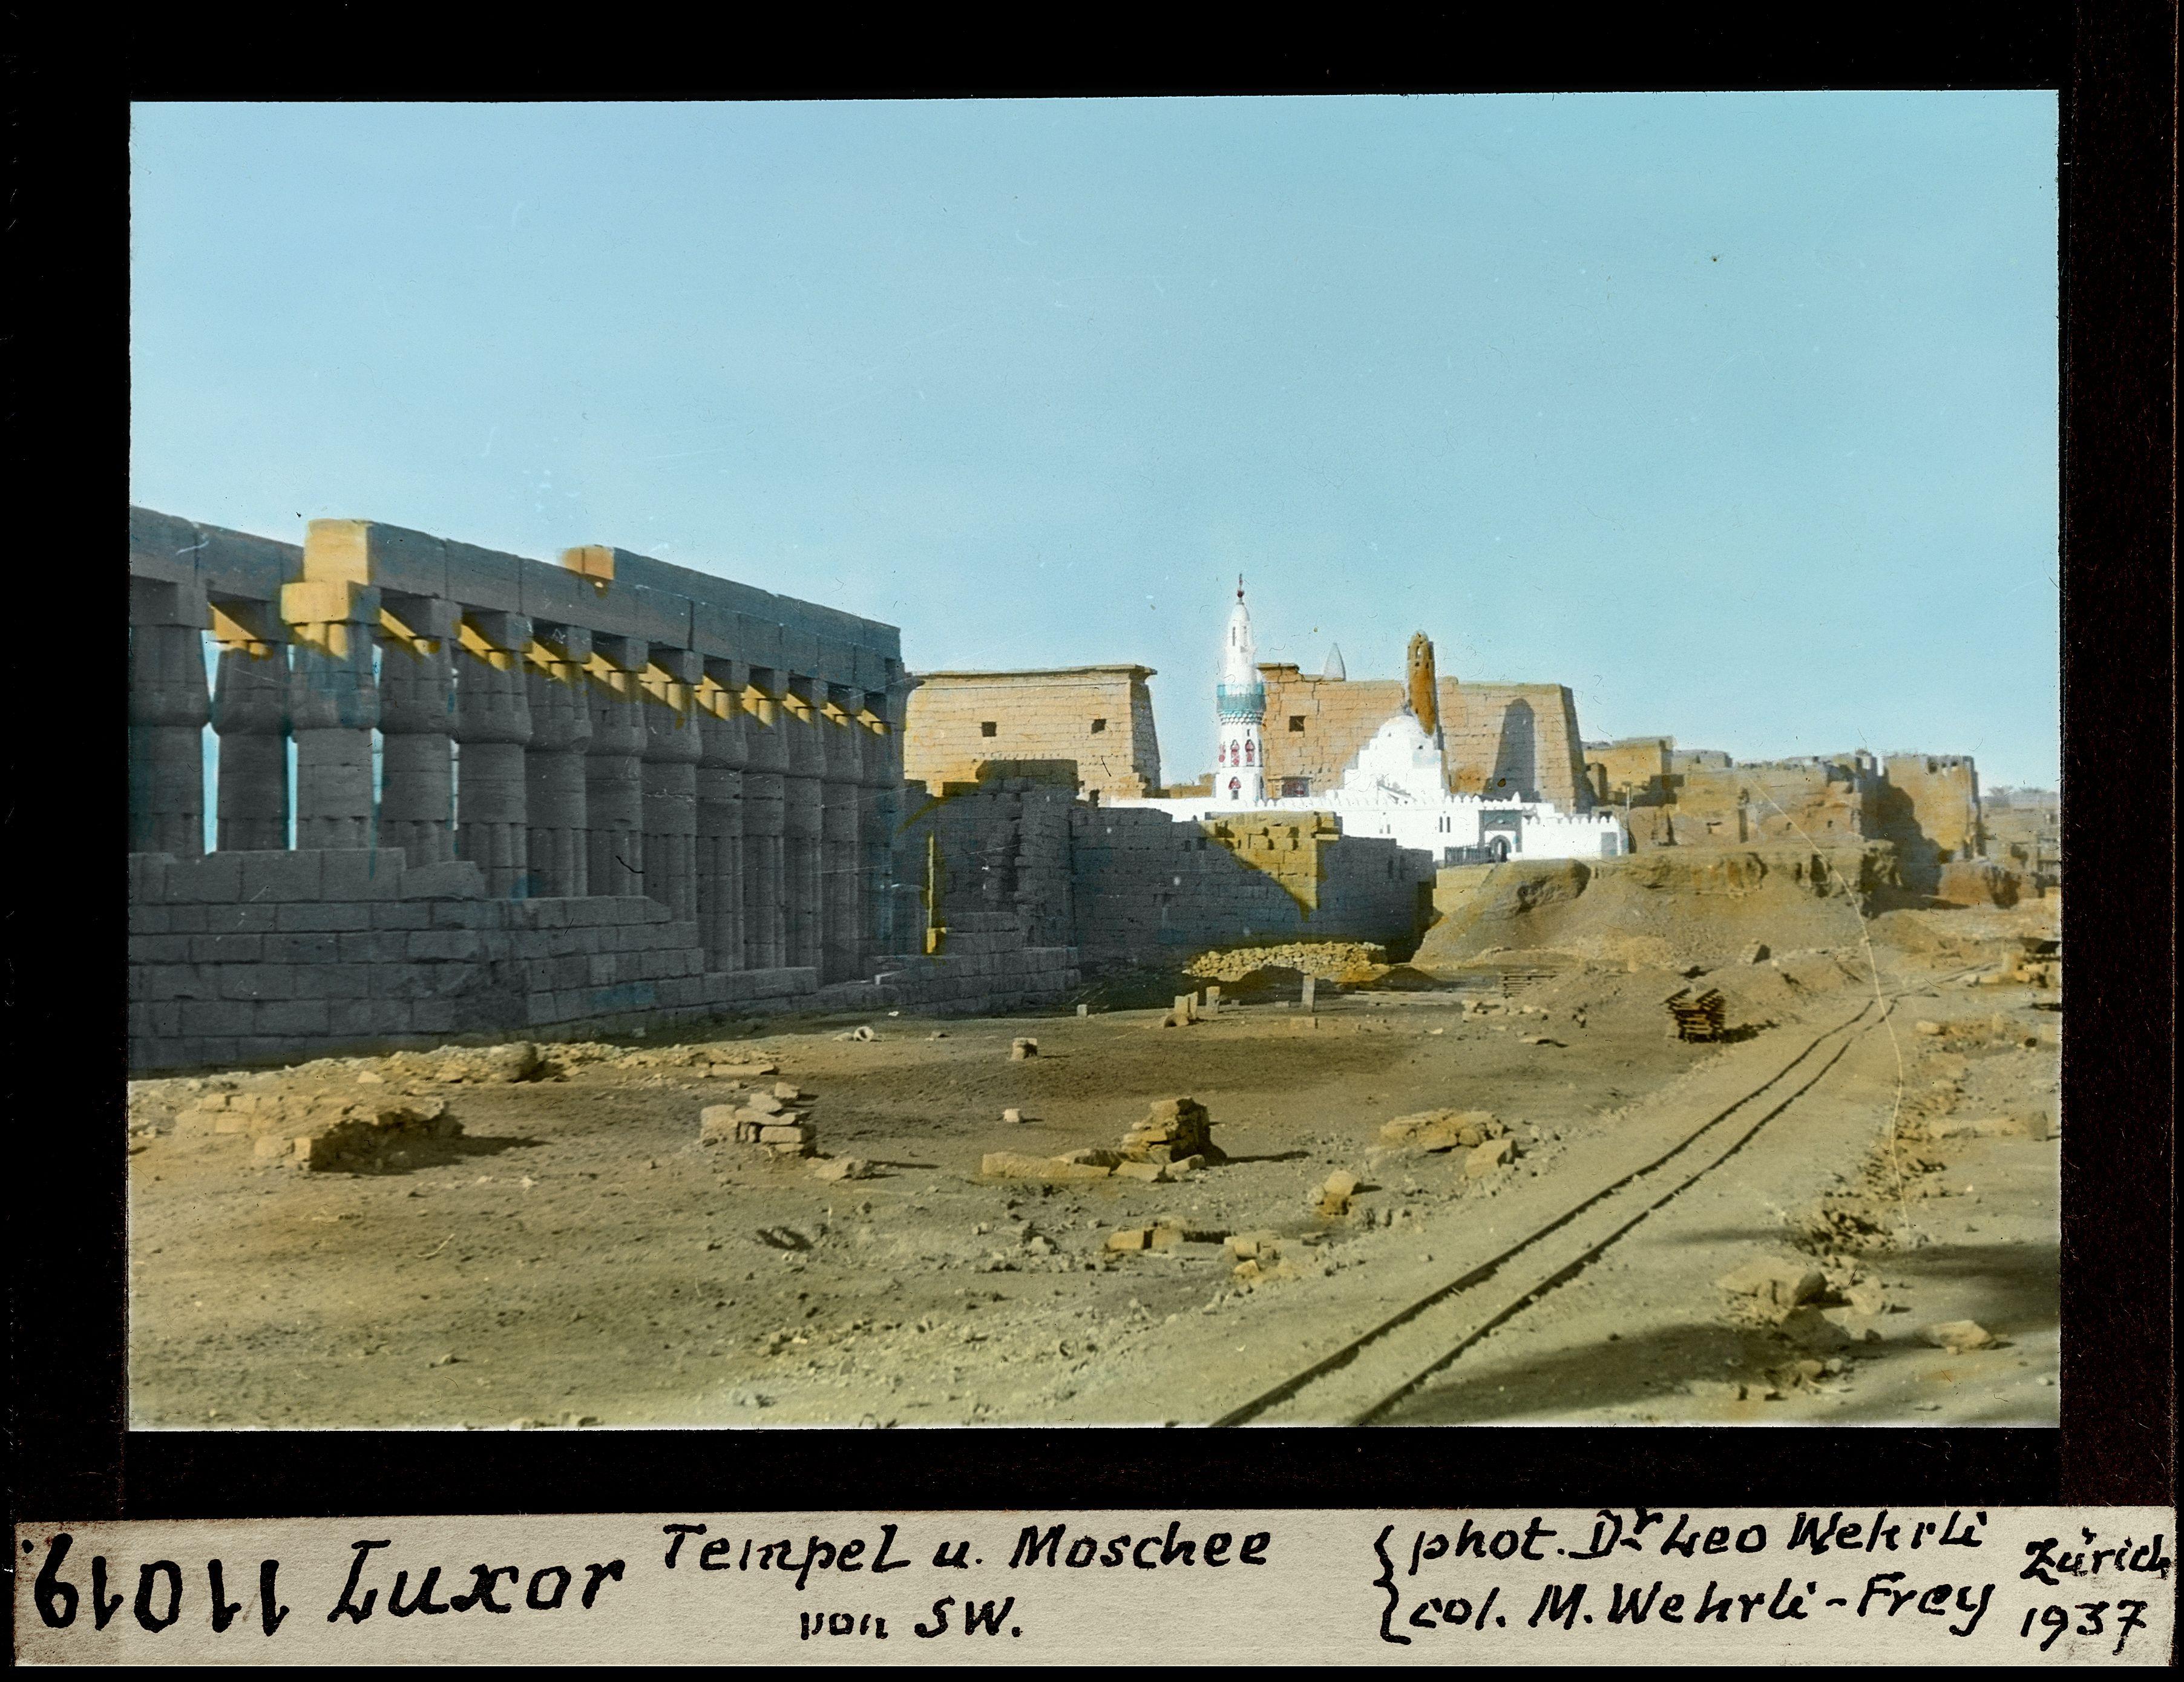 Луксорский храм и мечеть с юго-запада